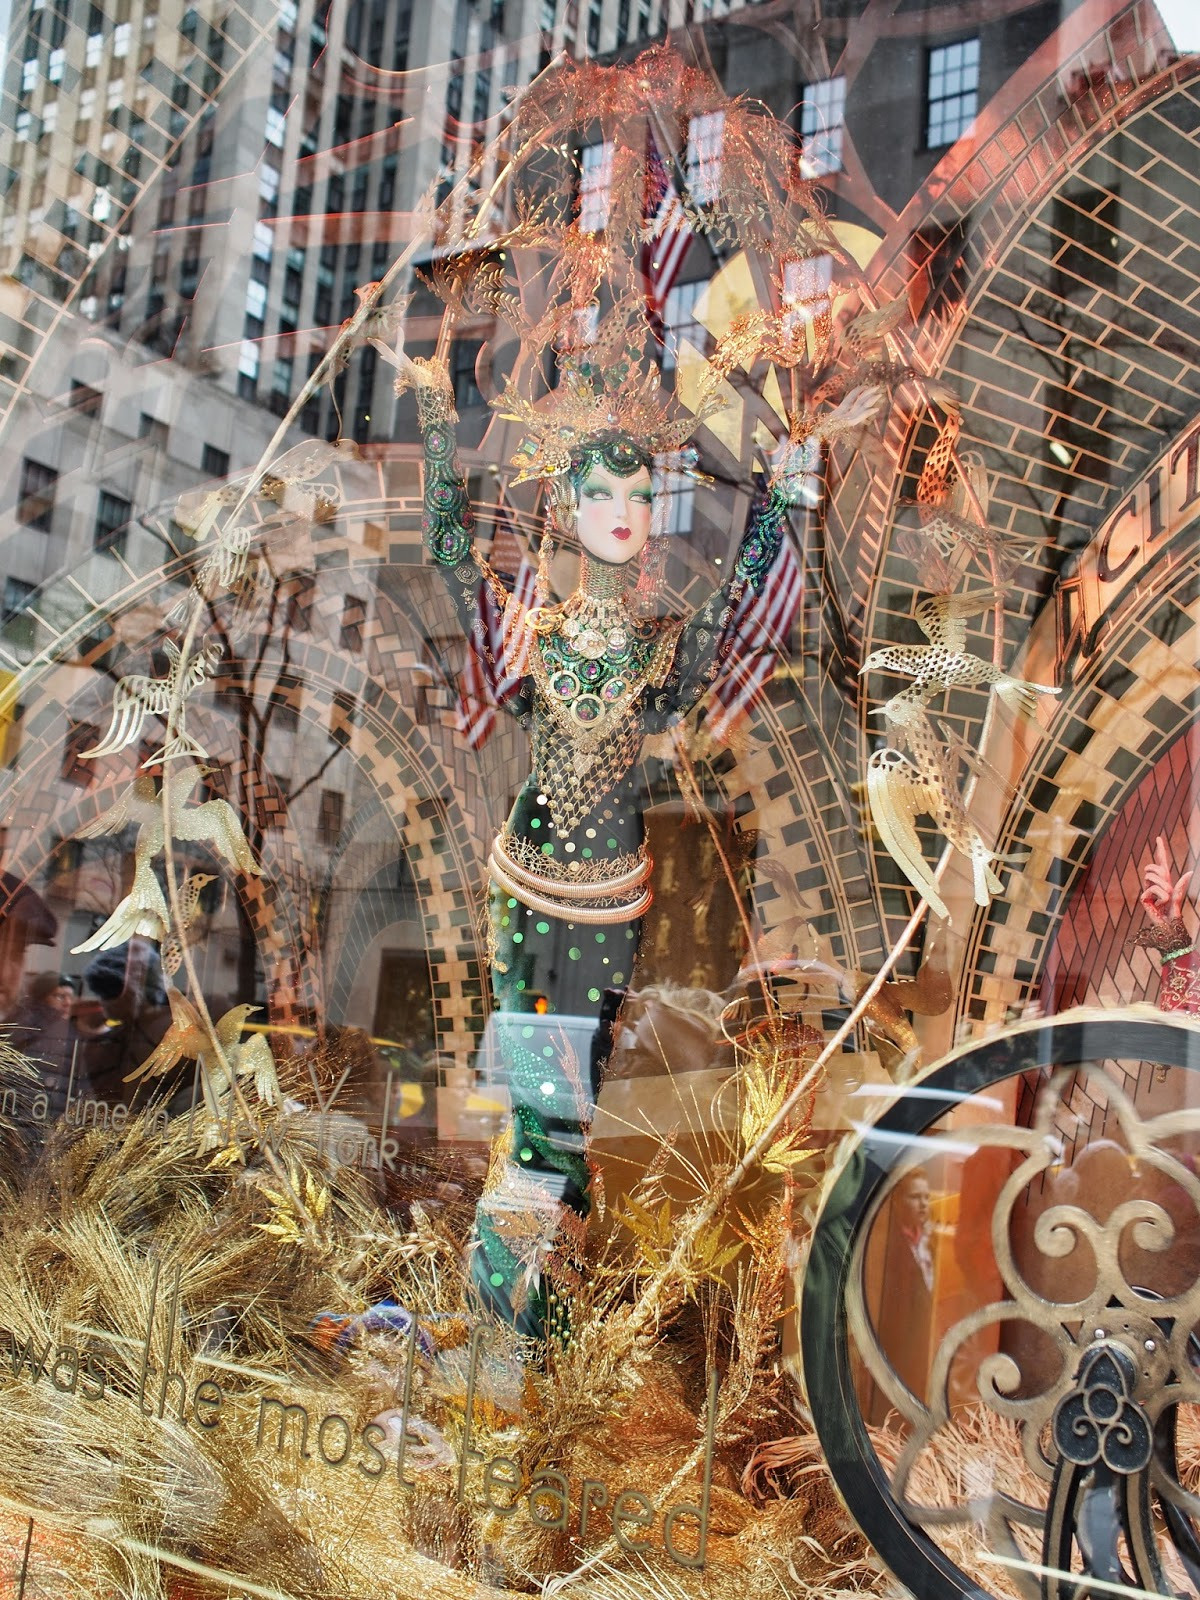 Erte in a Sea of Gold #erteinaseaofgold #anenchantedexperience #saksholiday #saks #nyc  ©2014 Nancy Lundebjerg